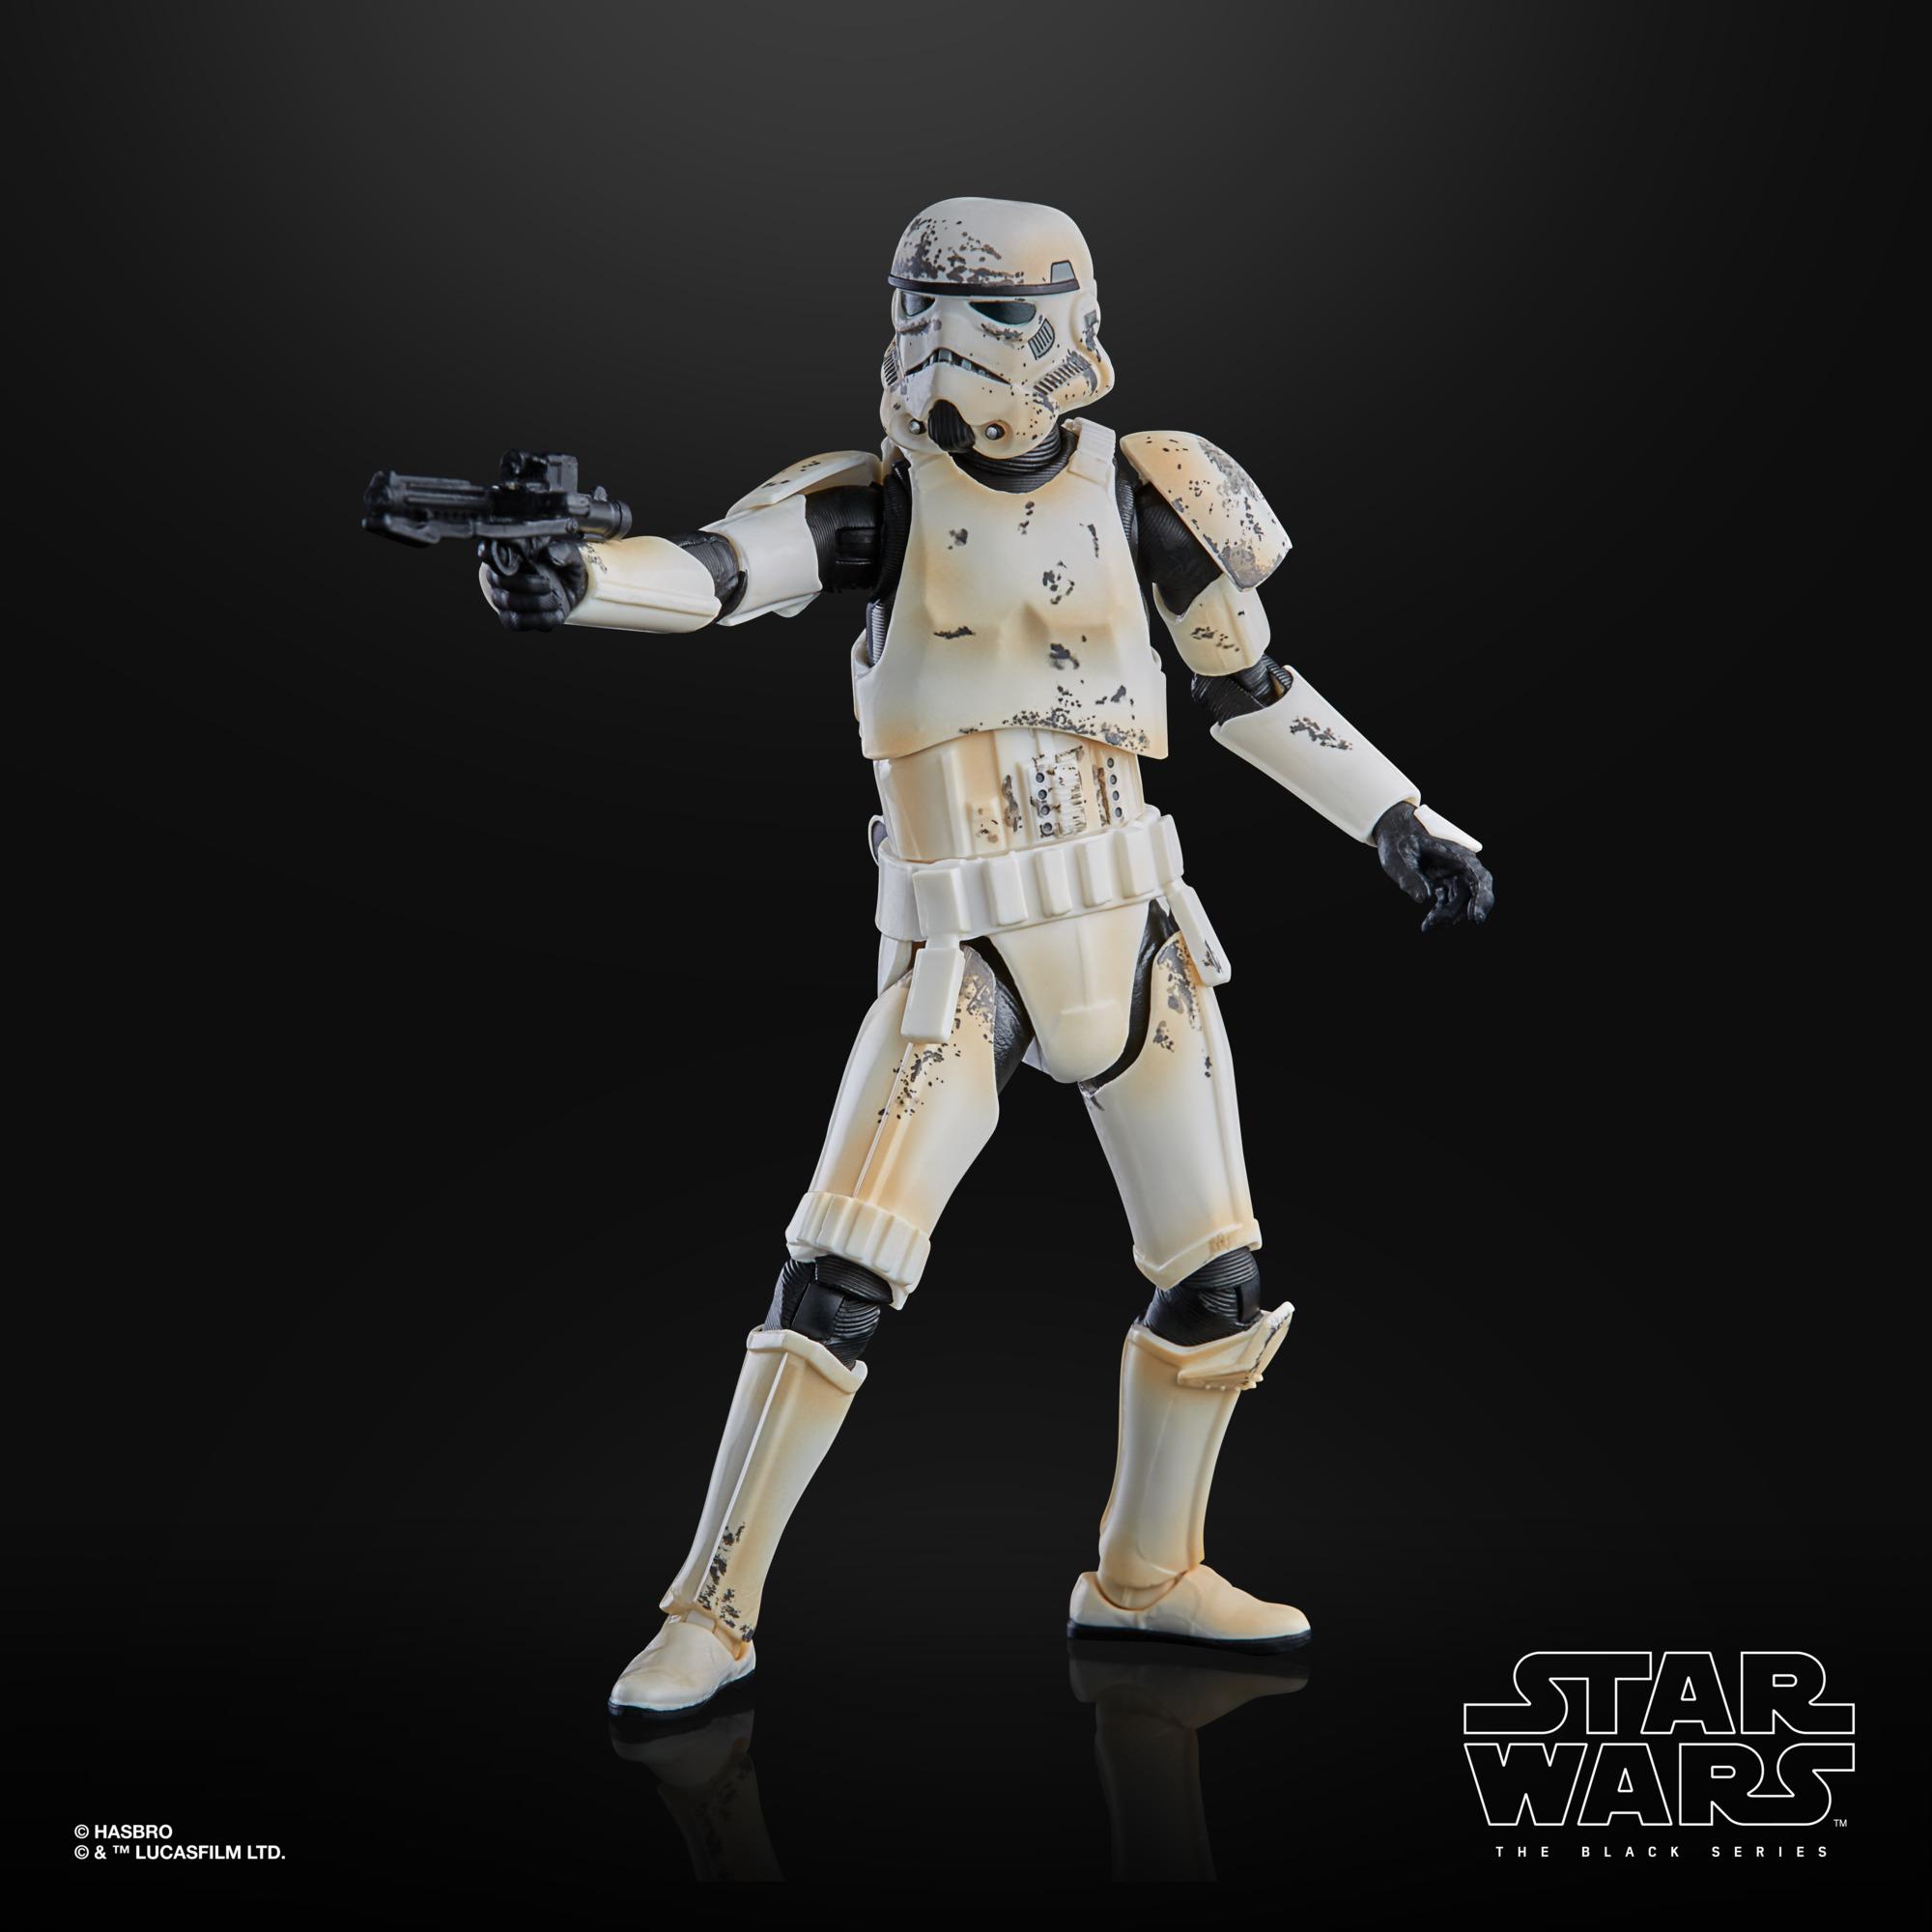 Star Wars The Black Series Remnant Stormtrooper Exclusive Action Figure 15cm HASF1862 5010993813360